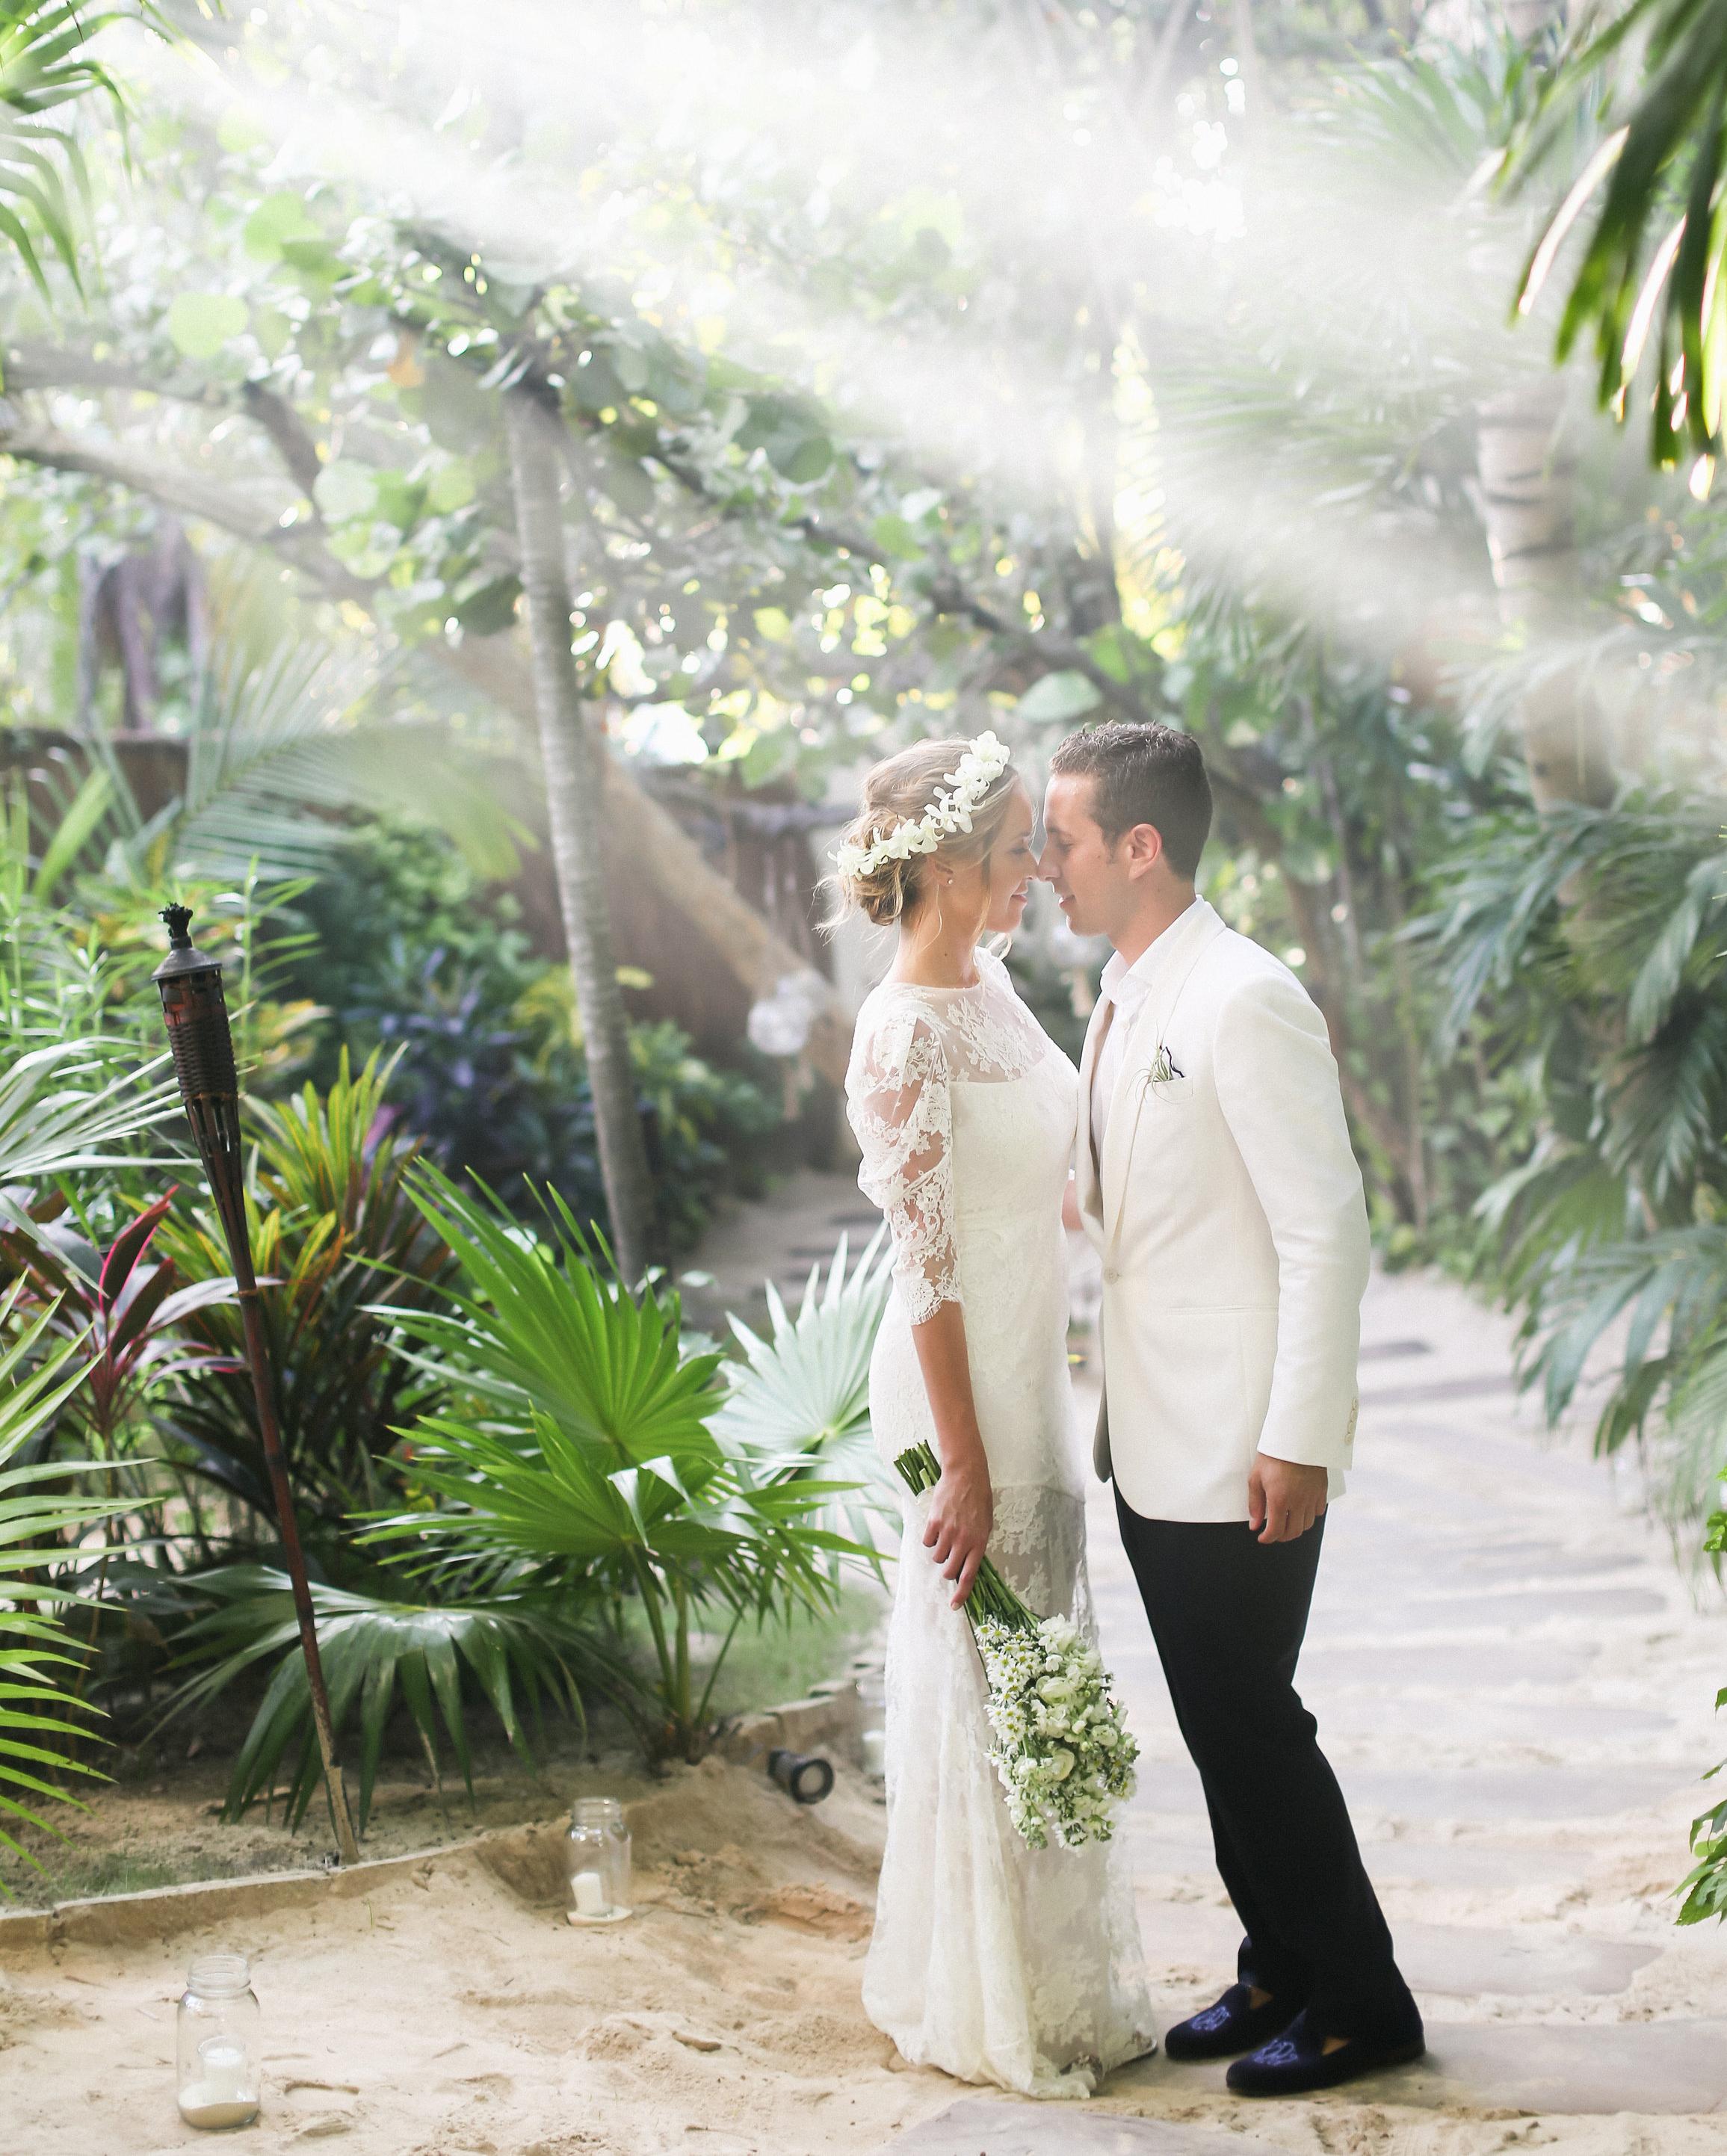 olivia-keith-wedding-couple-13-s112304-0815.jpg